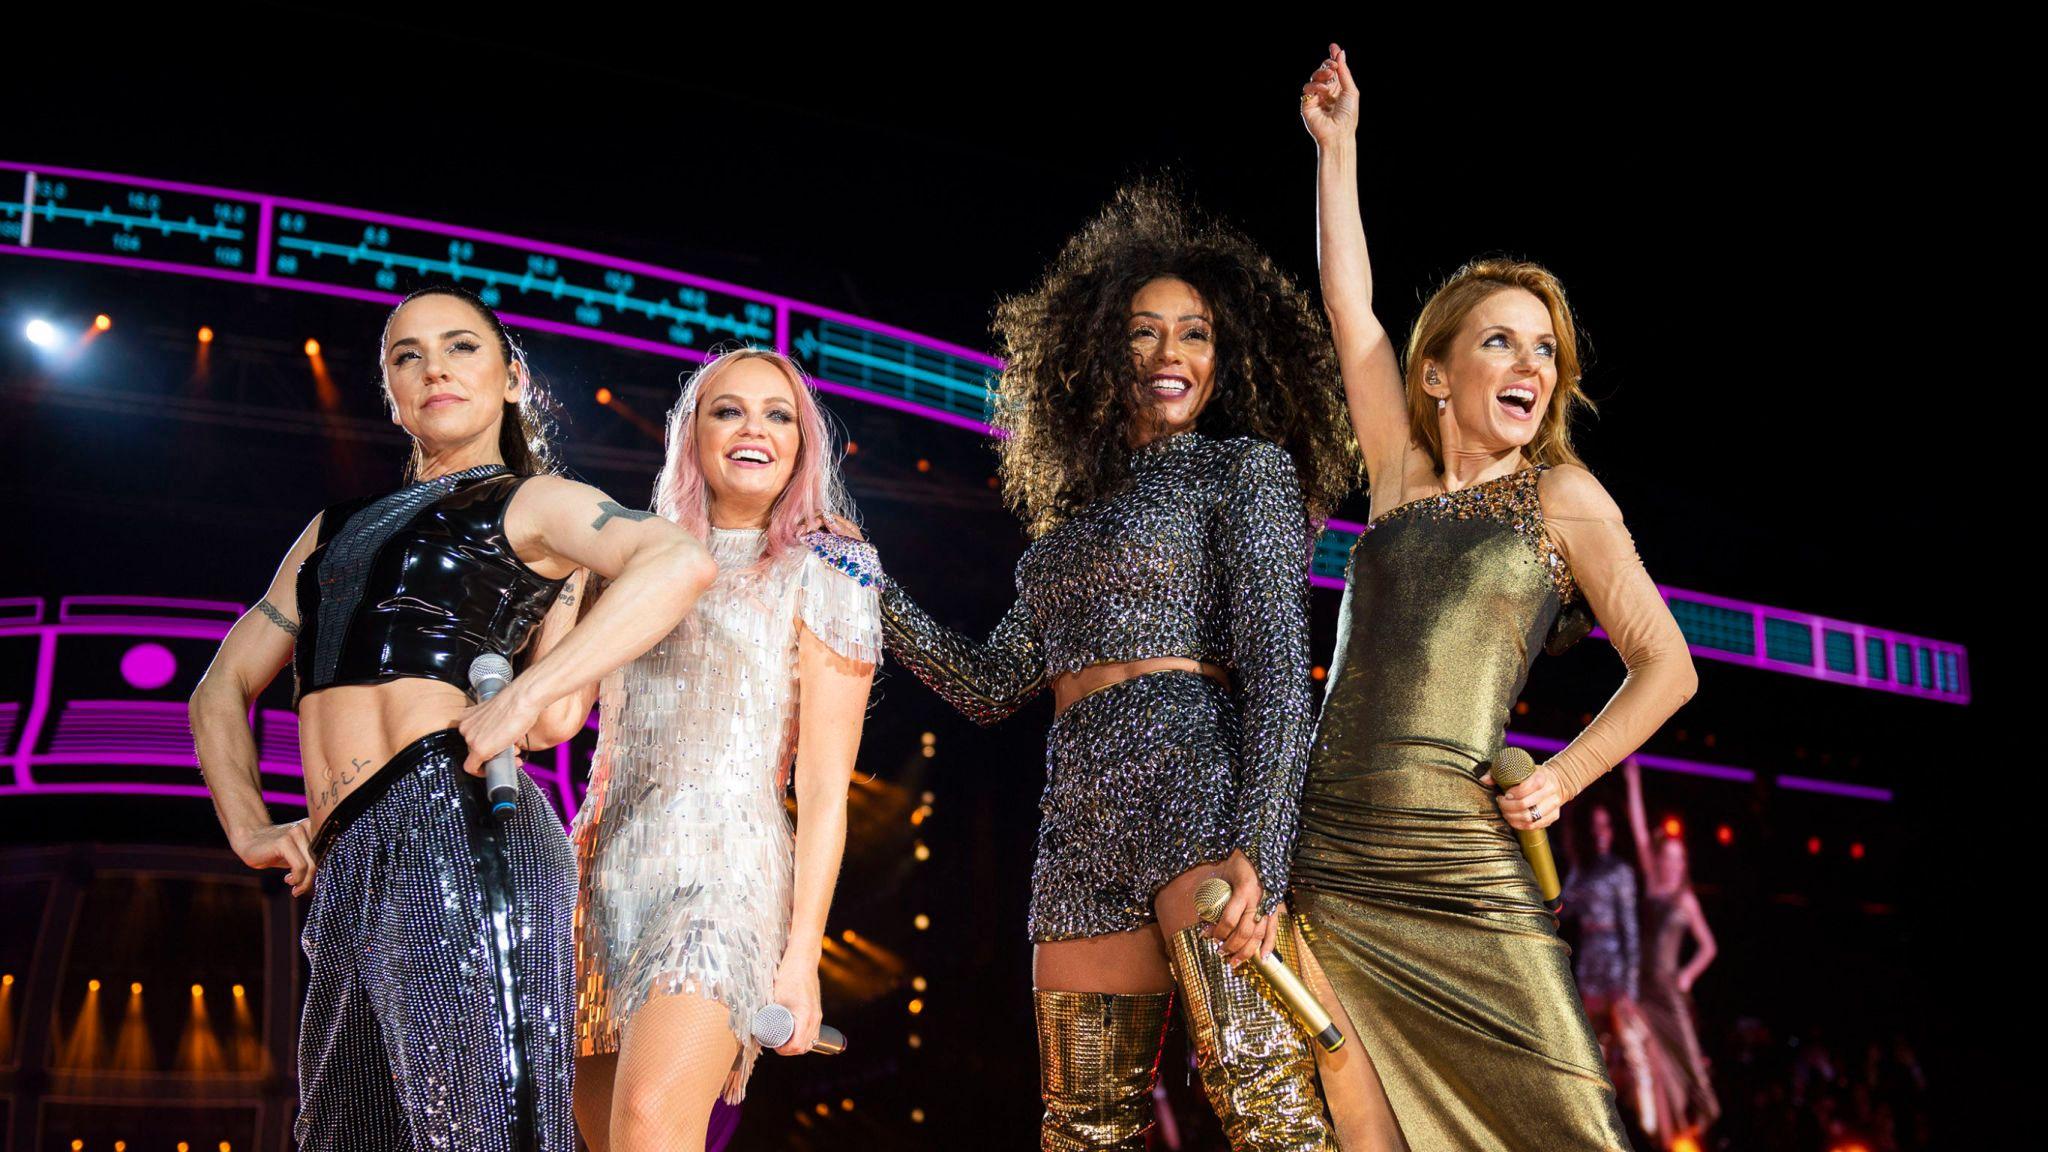 Melanie Chisholm, Emma Bunton, Melanie Brown and Geri Horner of the Spice Girls in concert at Wembley Stadium